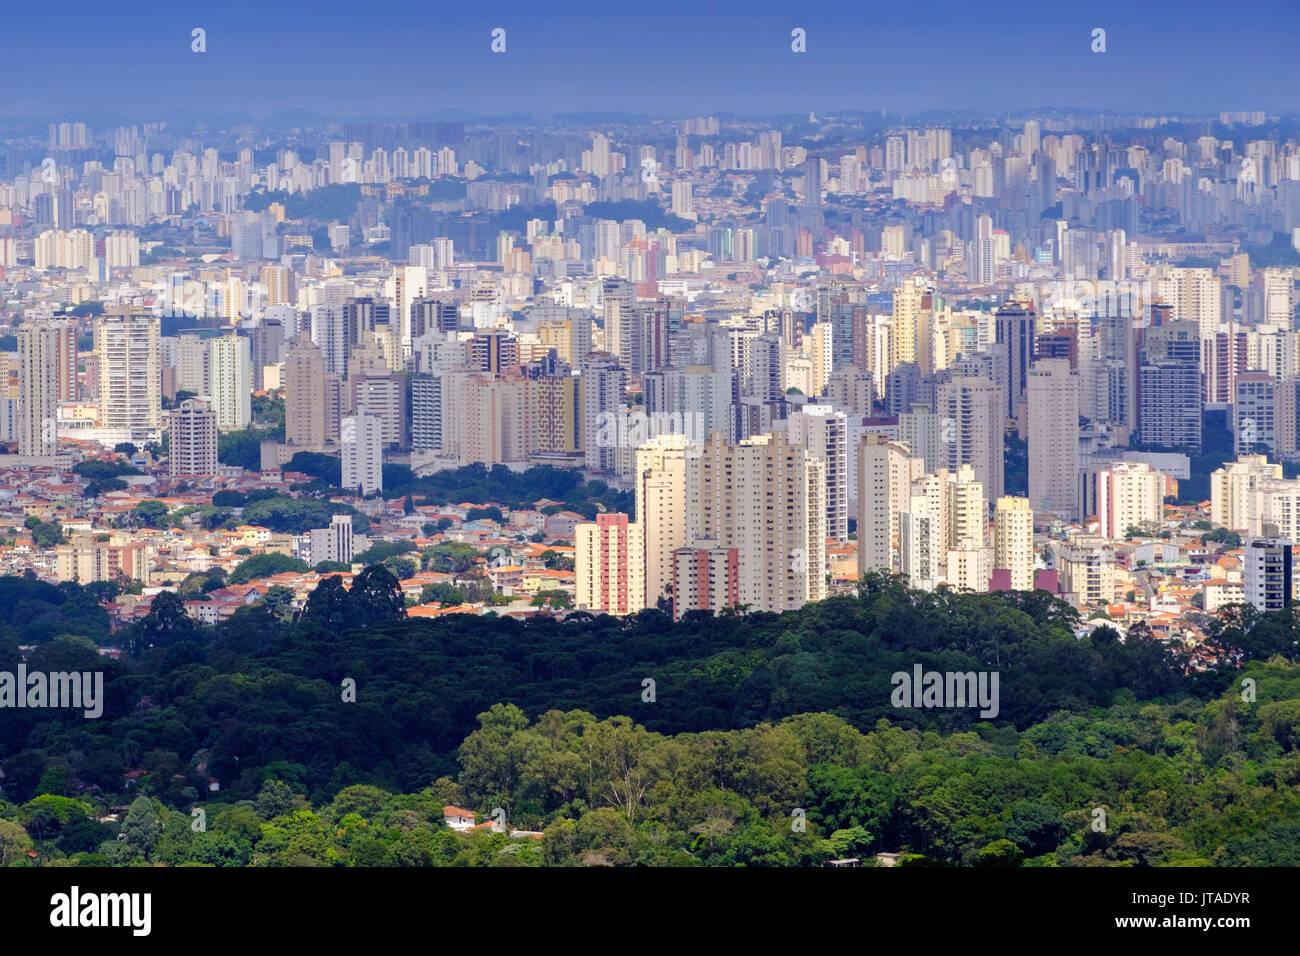 Vue de Sao Paulo ville dans la Serra da Cantareira State Park, Sao Paulo, Brésil, Amérique du Sud Photo Stock